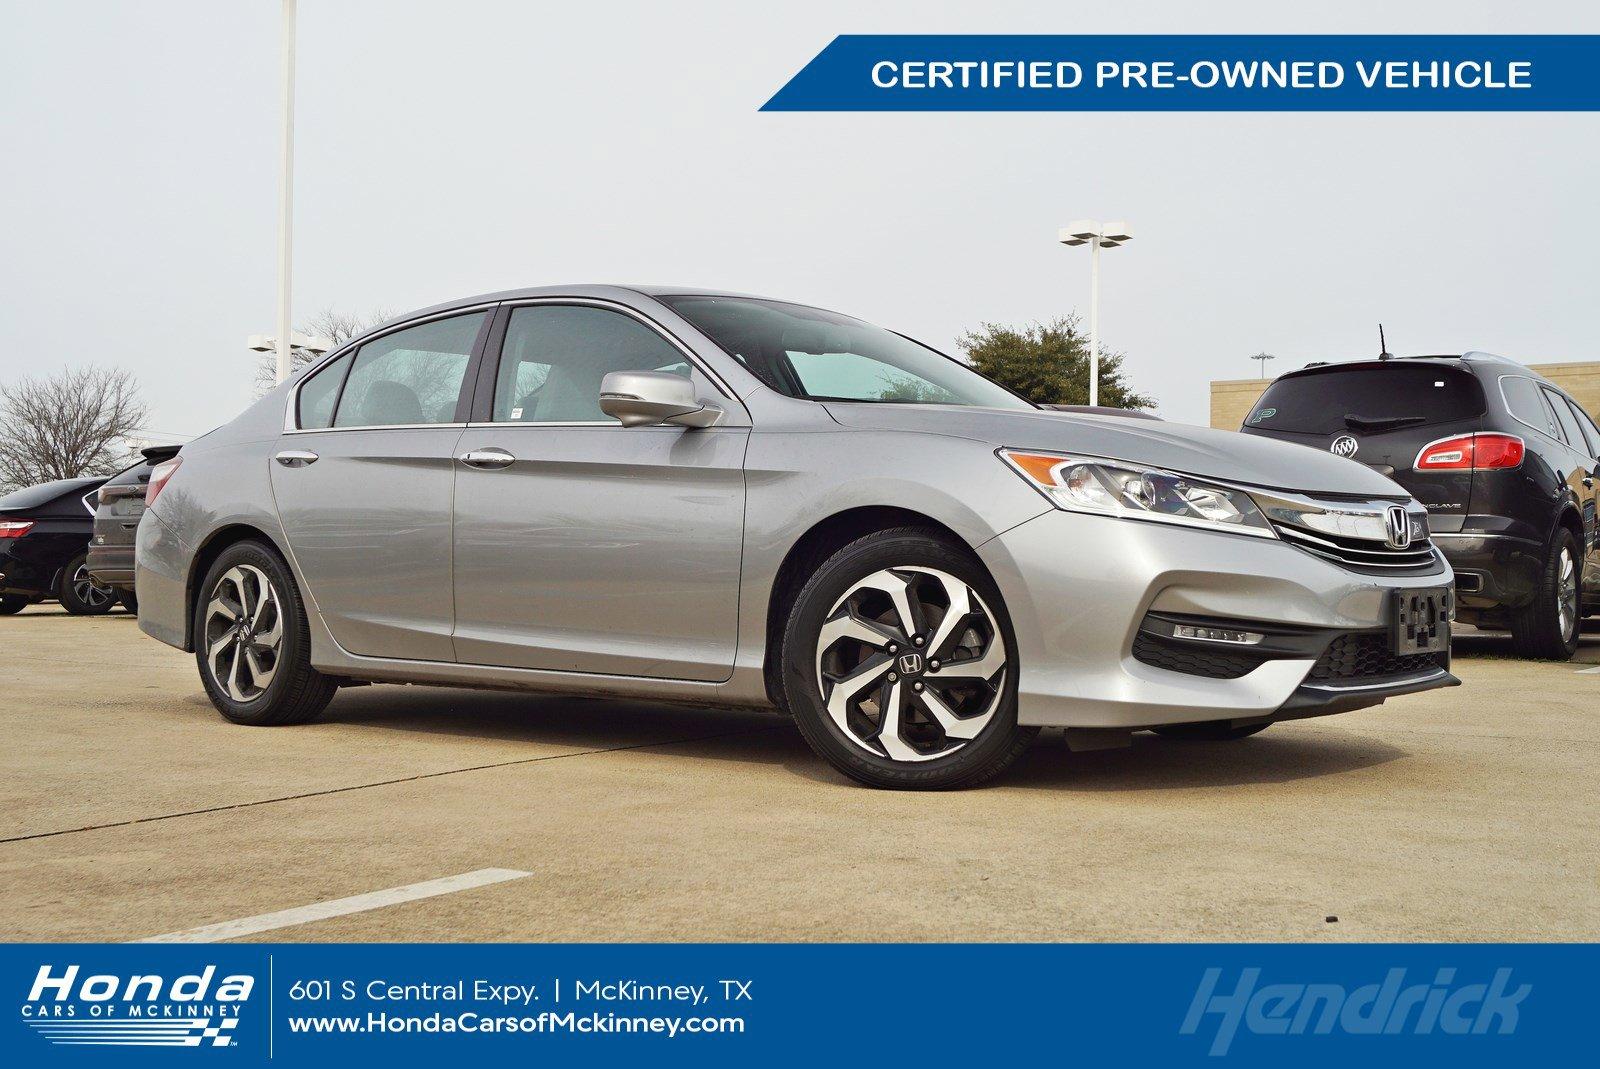 2017 Honda Accord EX-L Sedan image